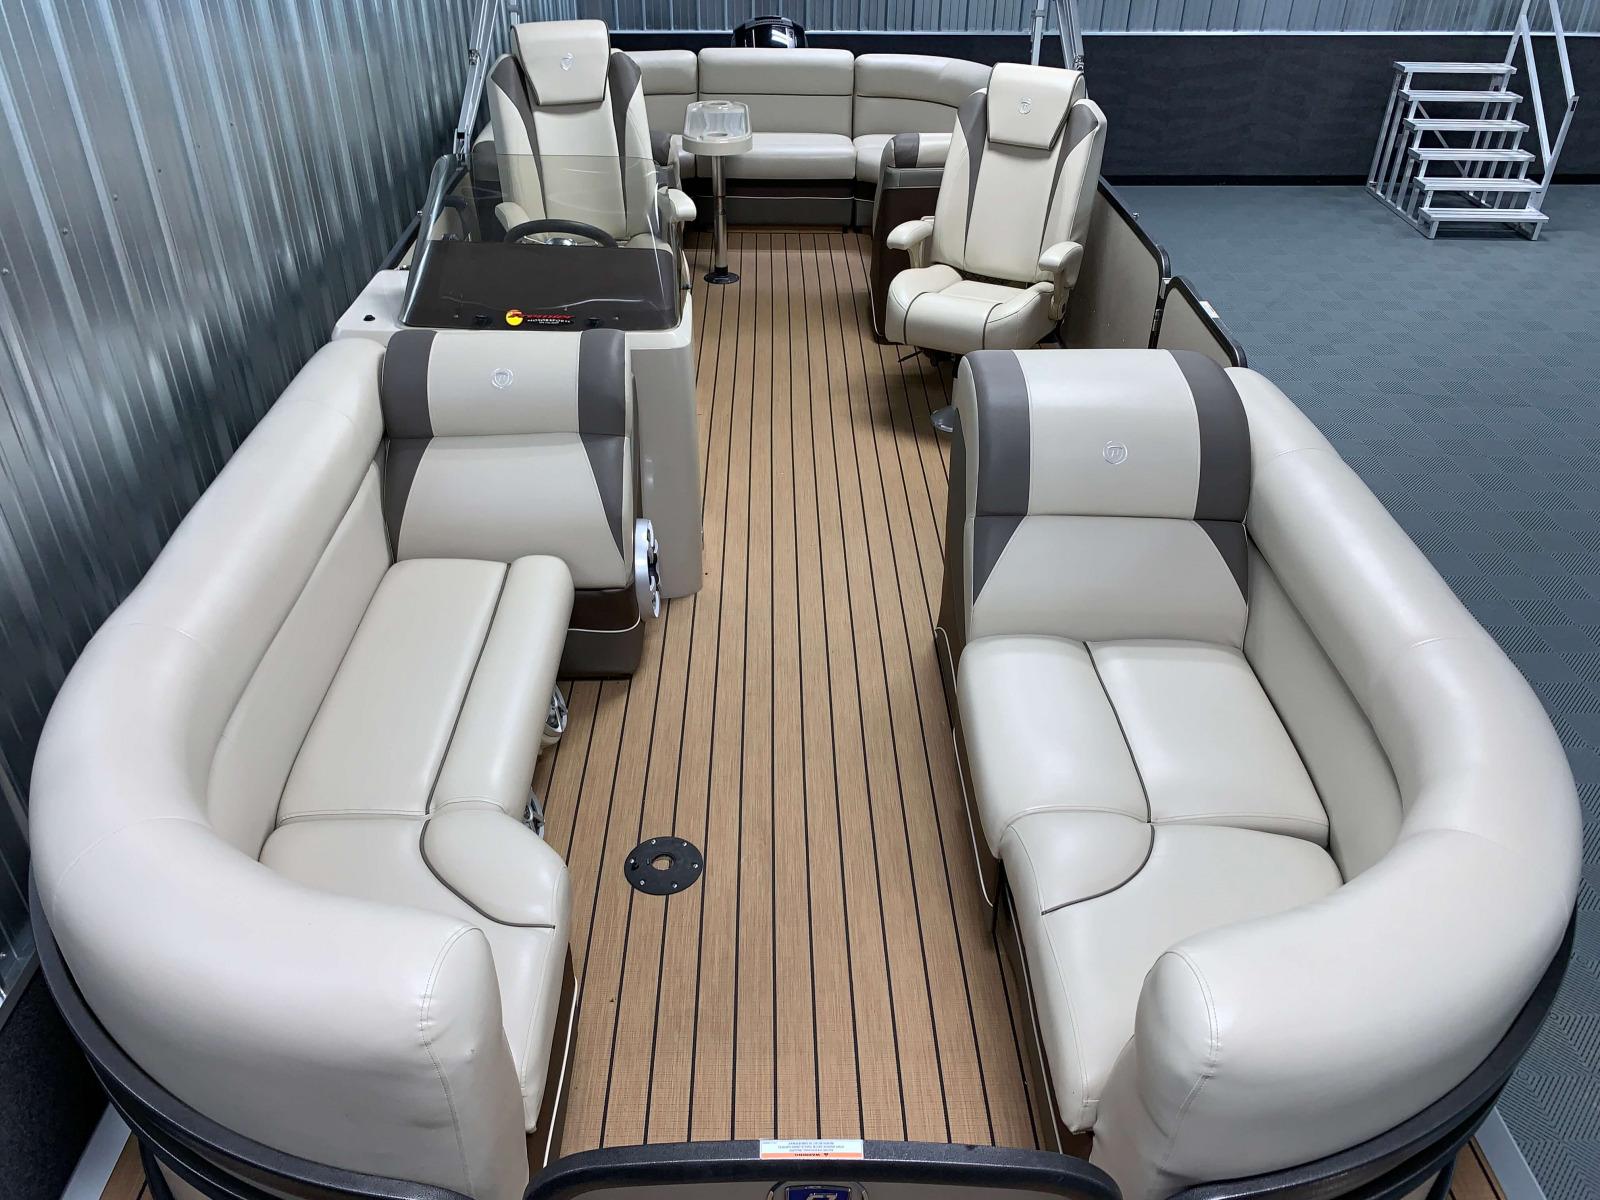 Interior Layout of the 2017 Premier 250 Solaris RF Pontoon Boat